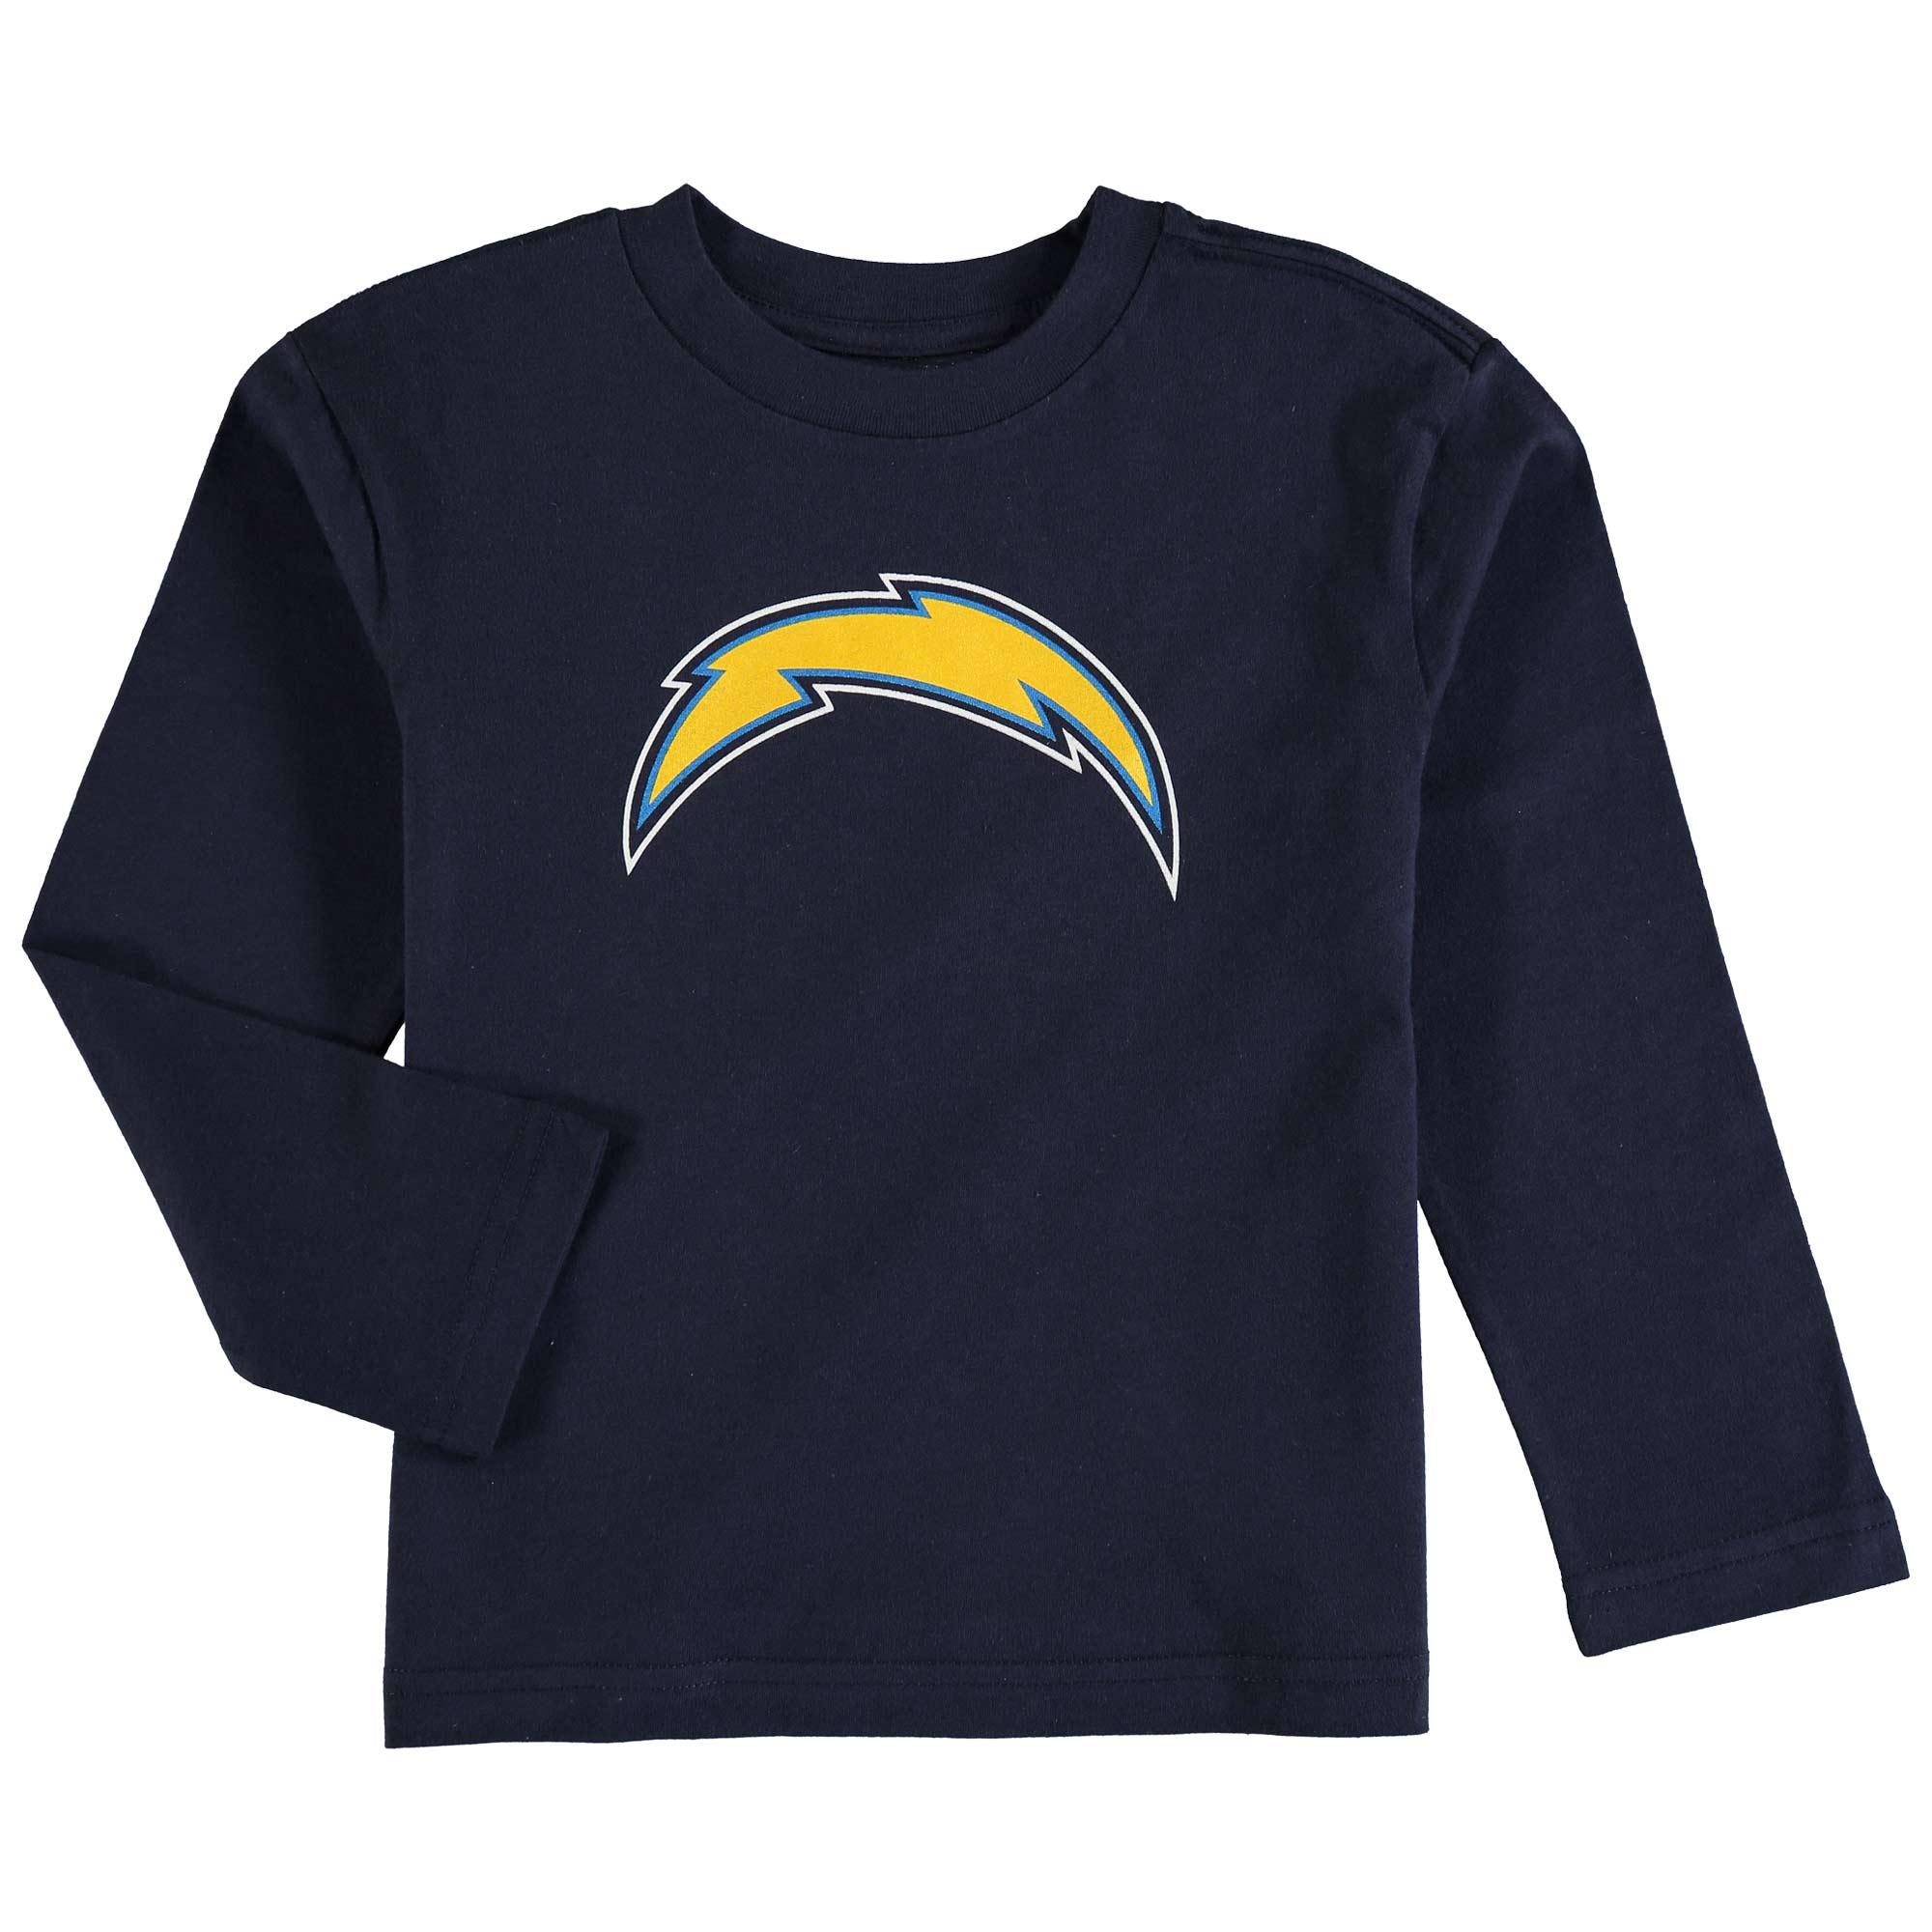 Los Angeles Chargers Preschool Team Logo Long Sleeve T-Shirt - Navy